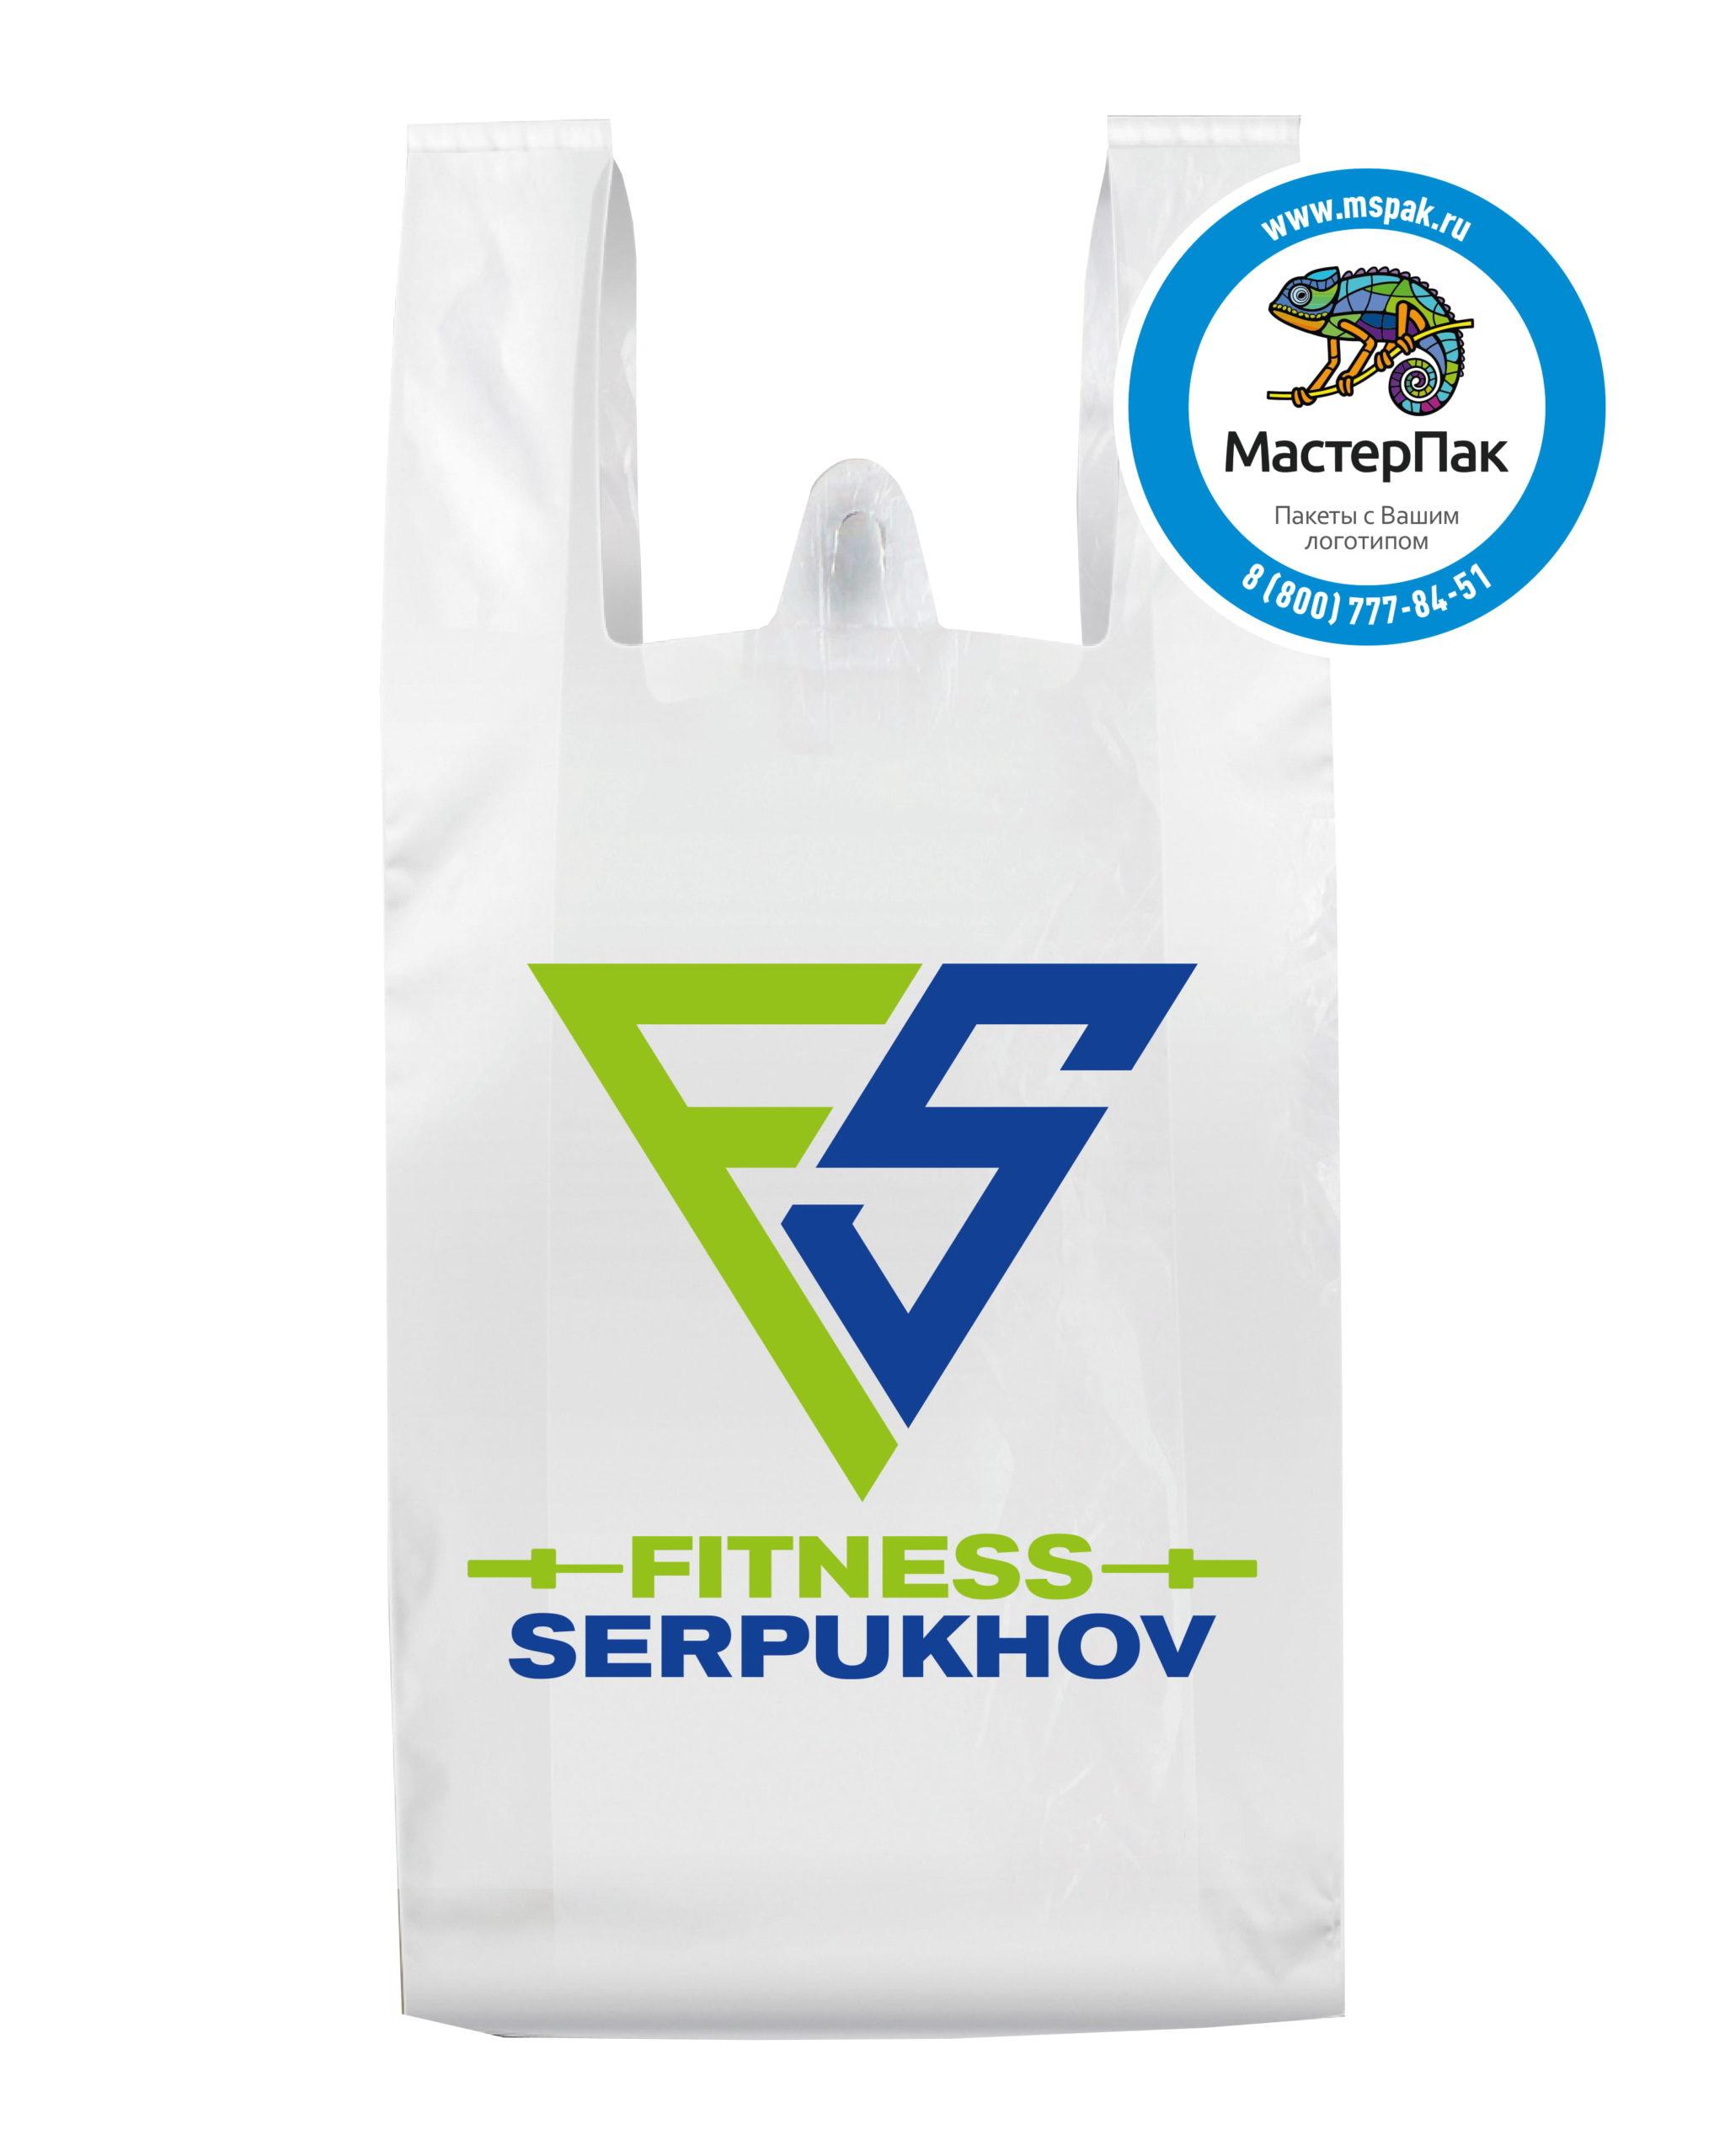 Пакет-майка ПНД с логотипом Fitness Serpukhov, 40*60 см, 23 мкм